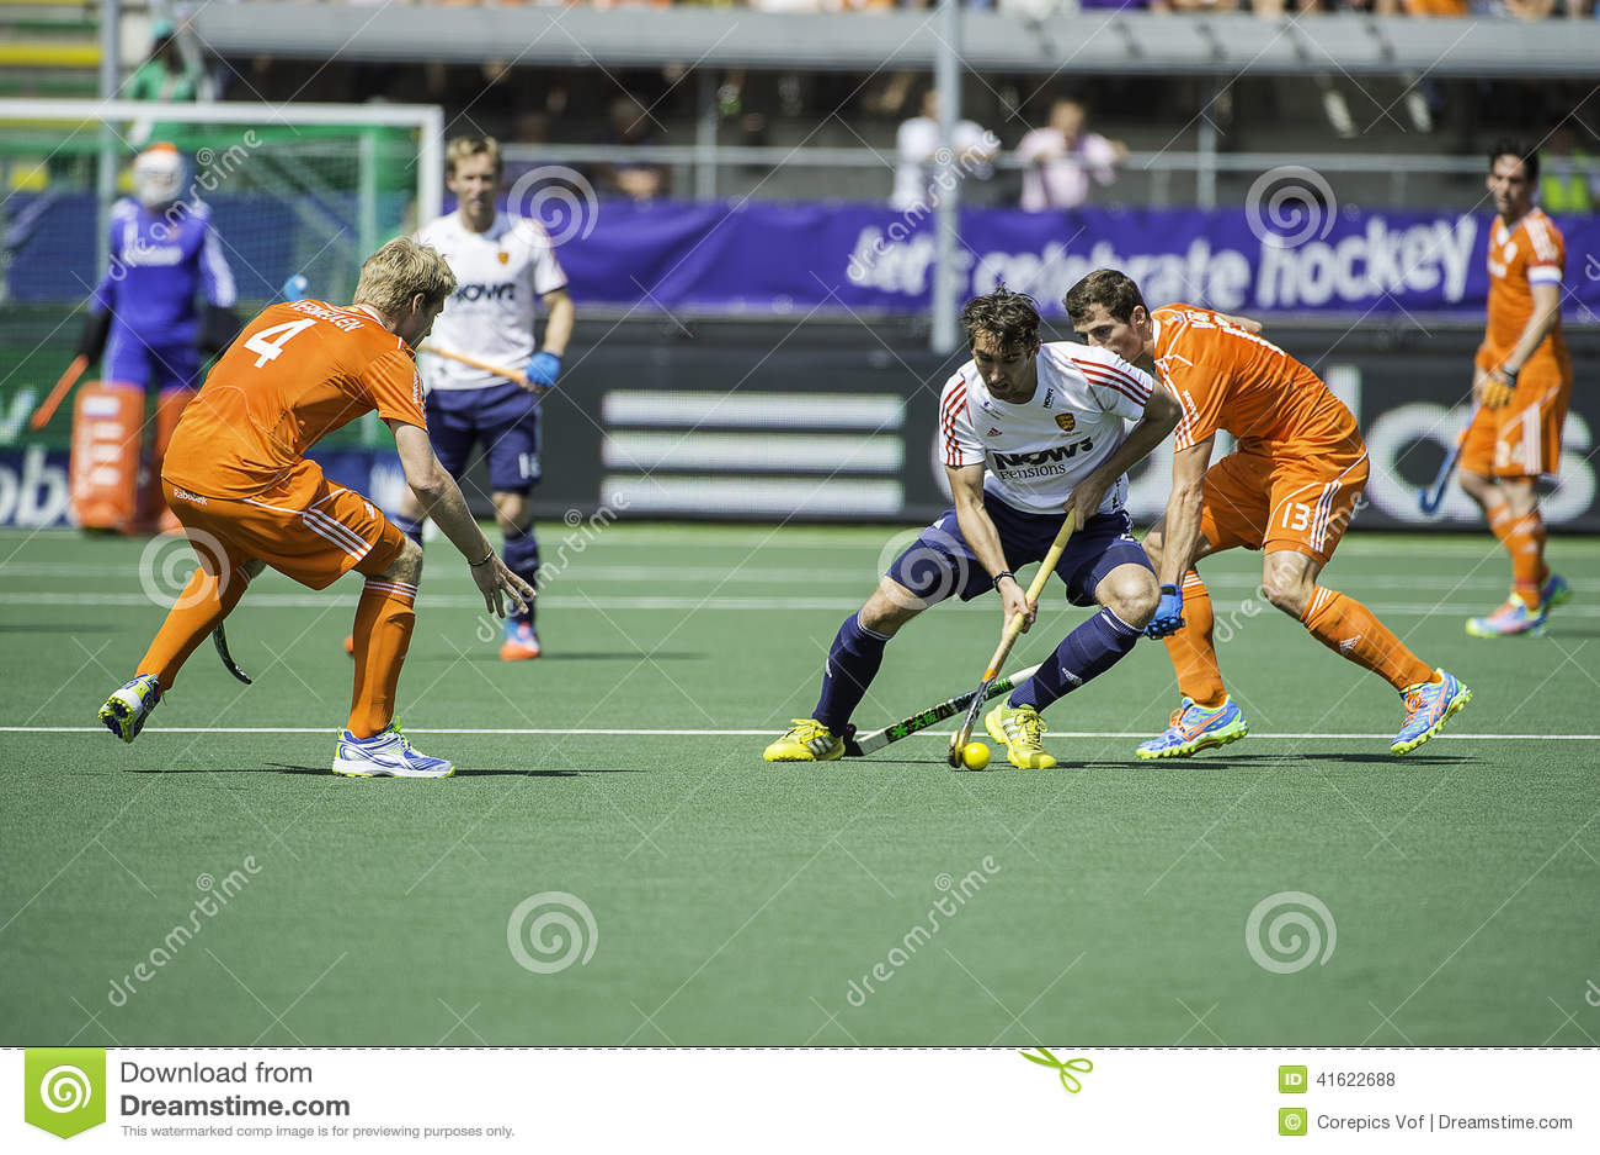 Semi-finals Netherlands vs England